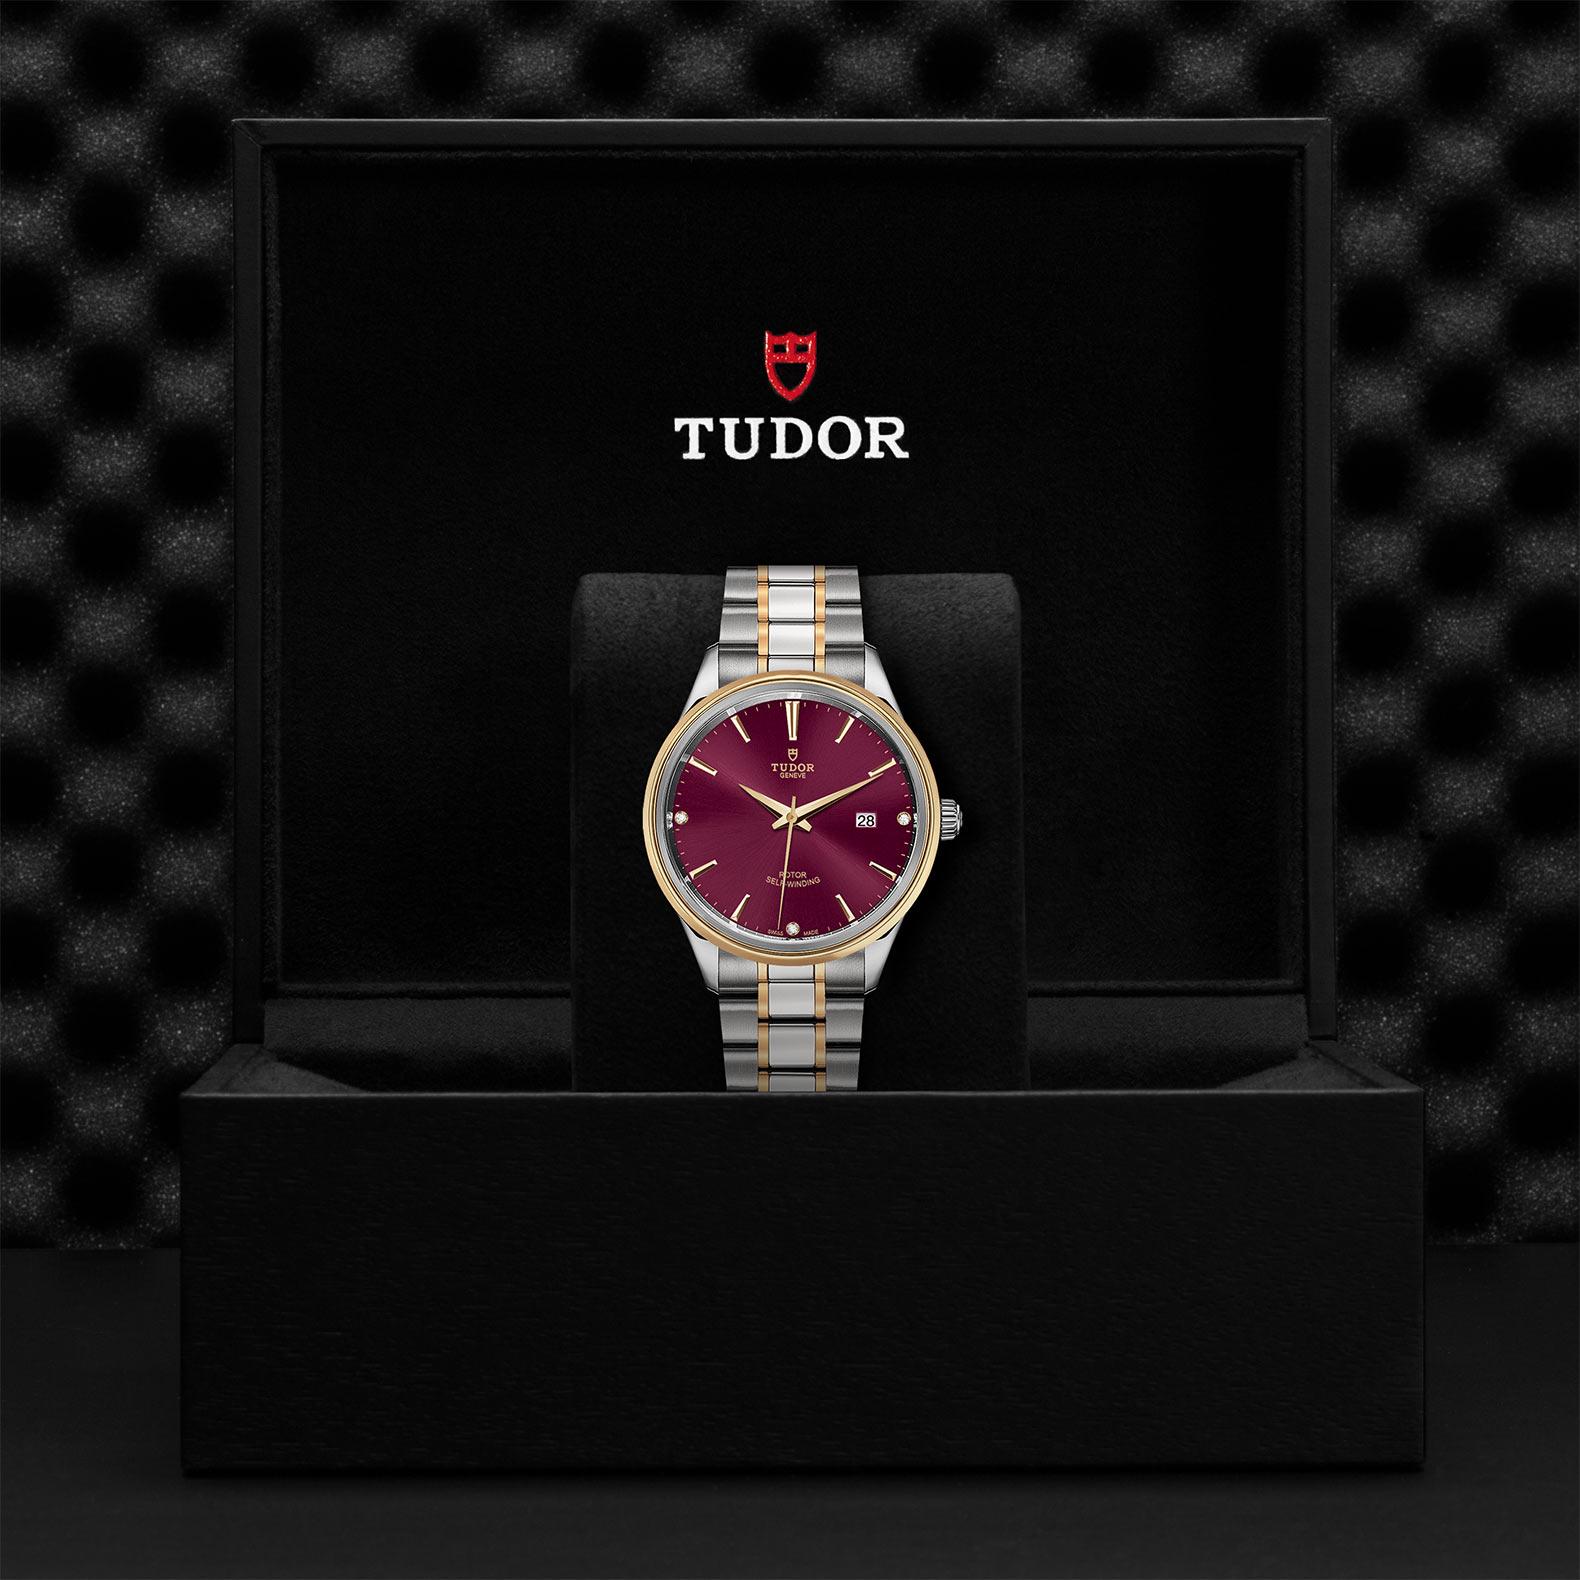 TUDOR Style M12703 0015 Presentationbox